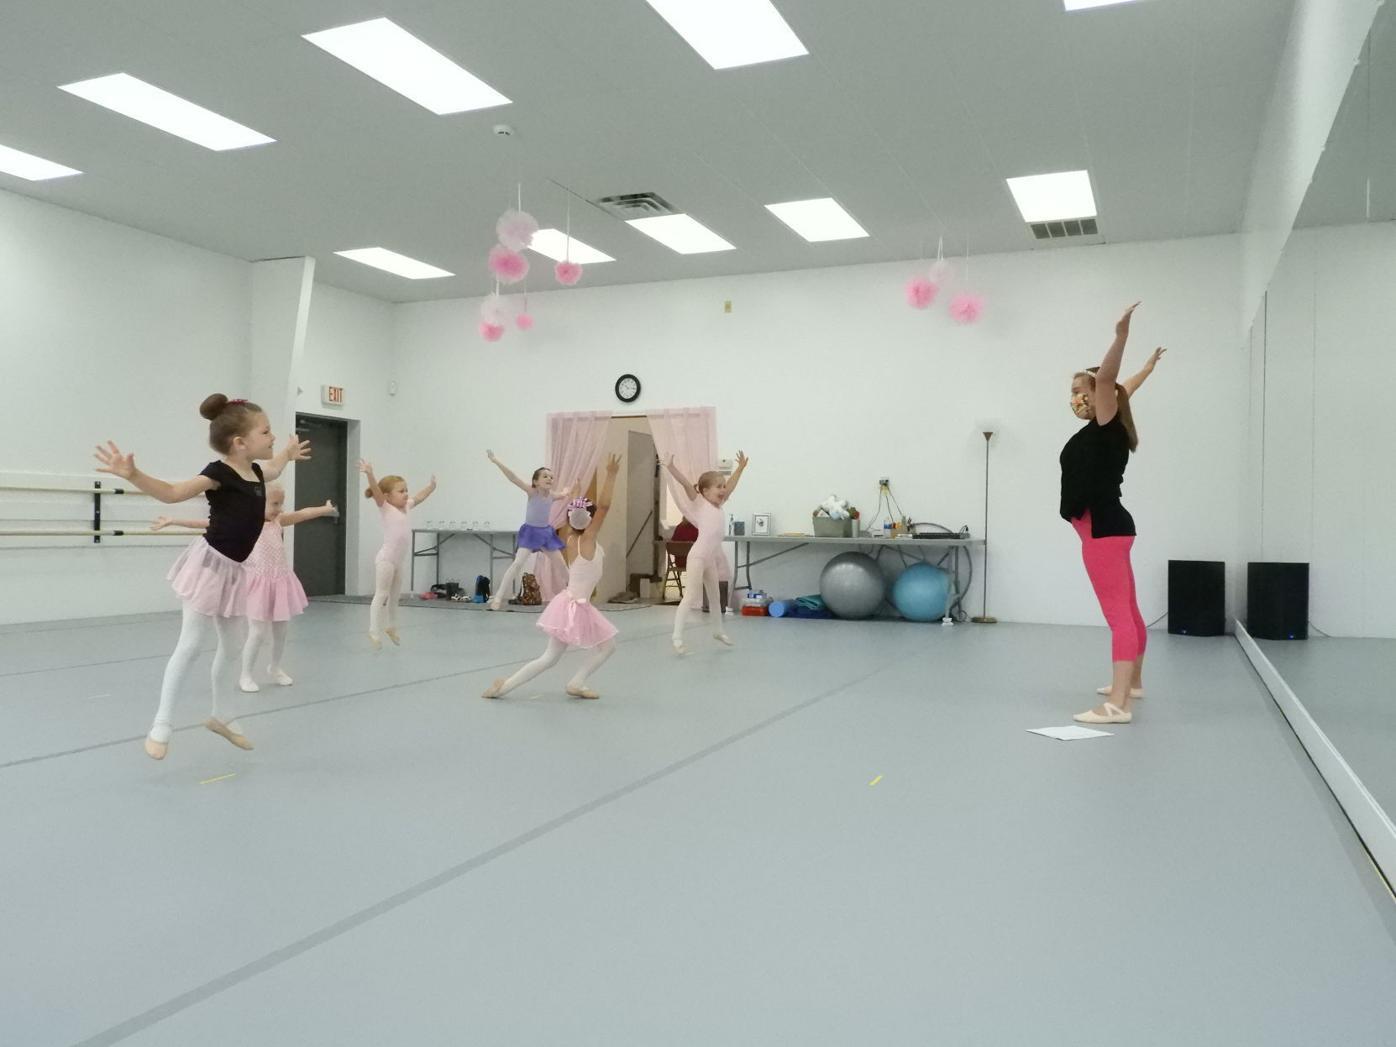 Dance studio classes